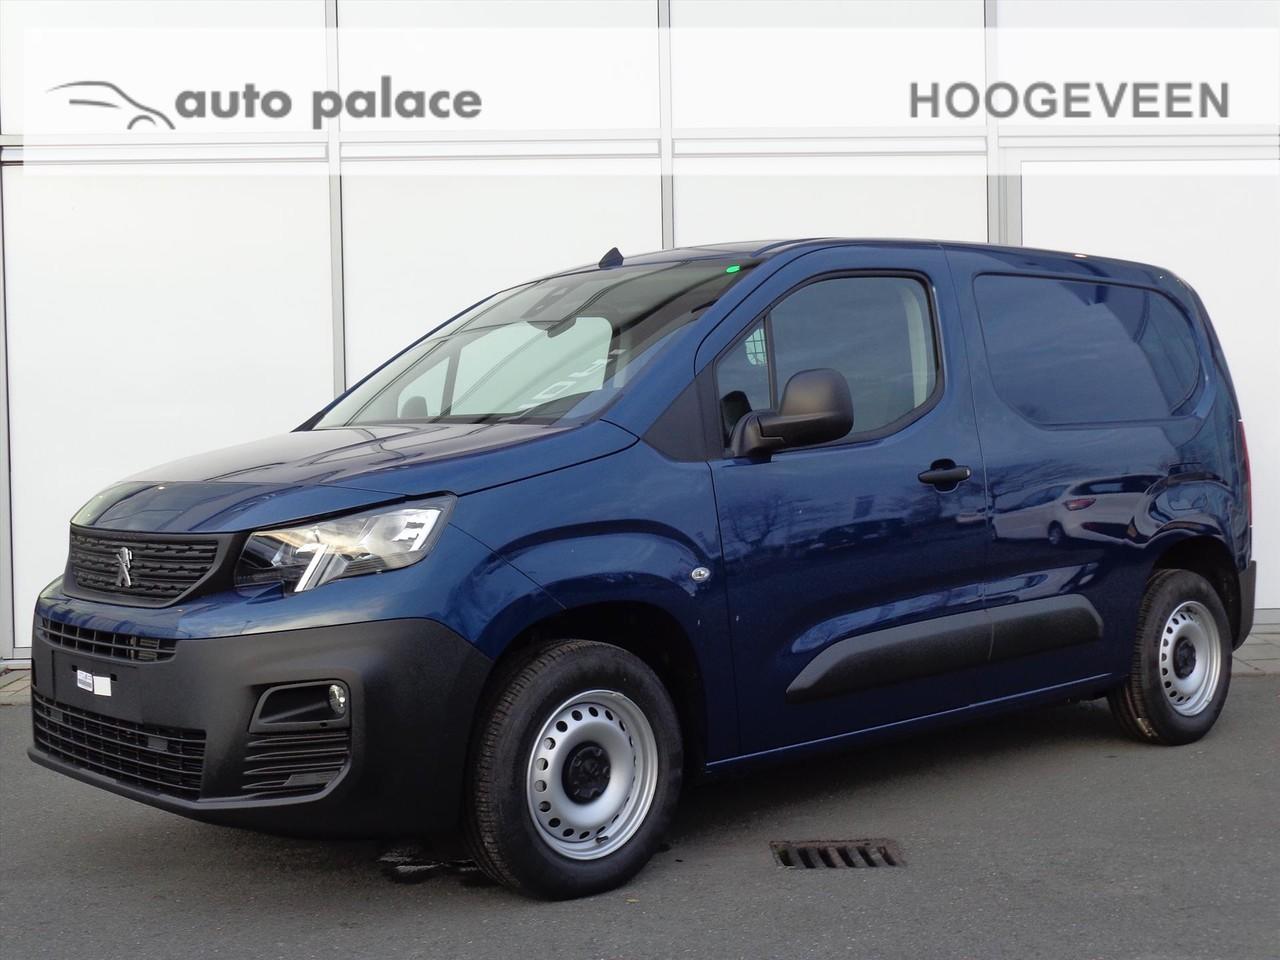 Peugeot Partner Premium 1.6 bluehdi 100pk 650kg navigatie airco pareersensoren